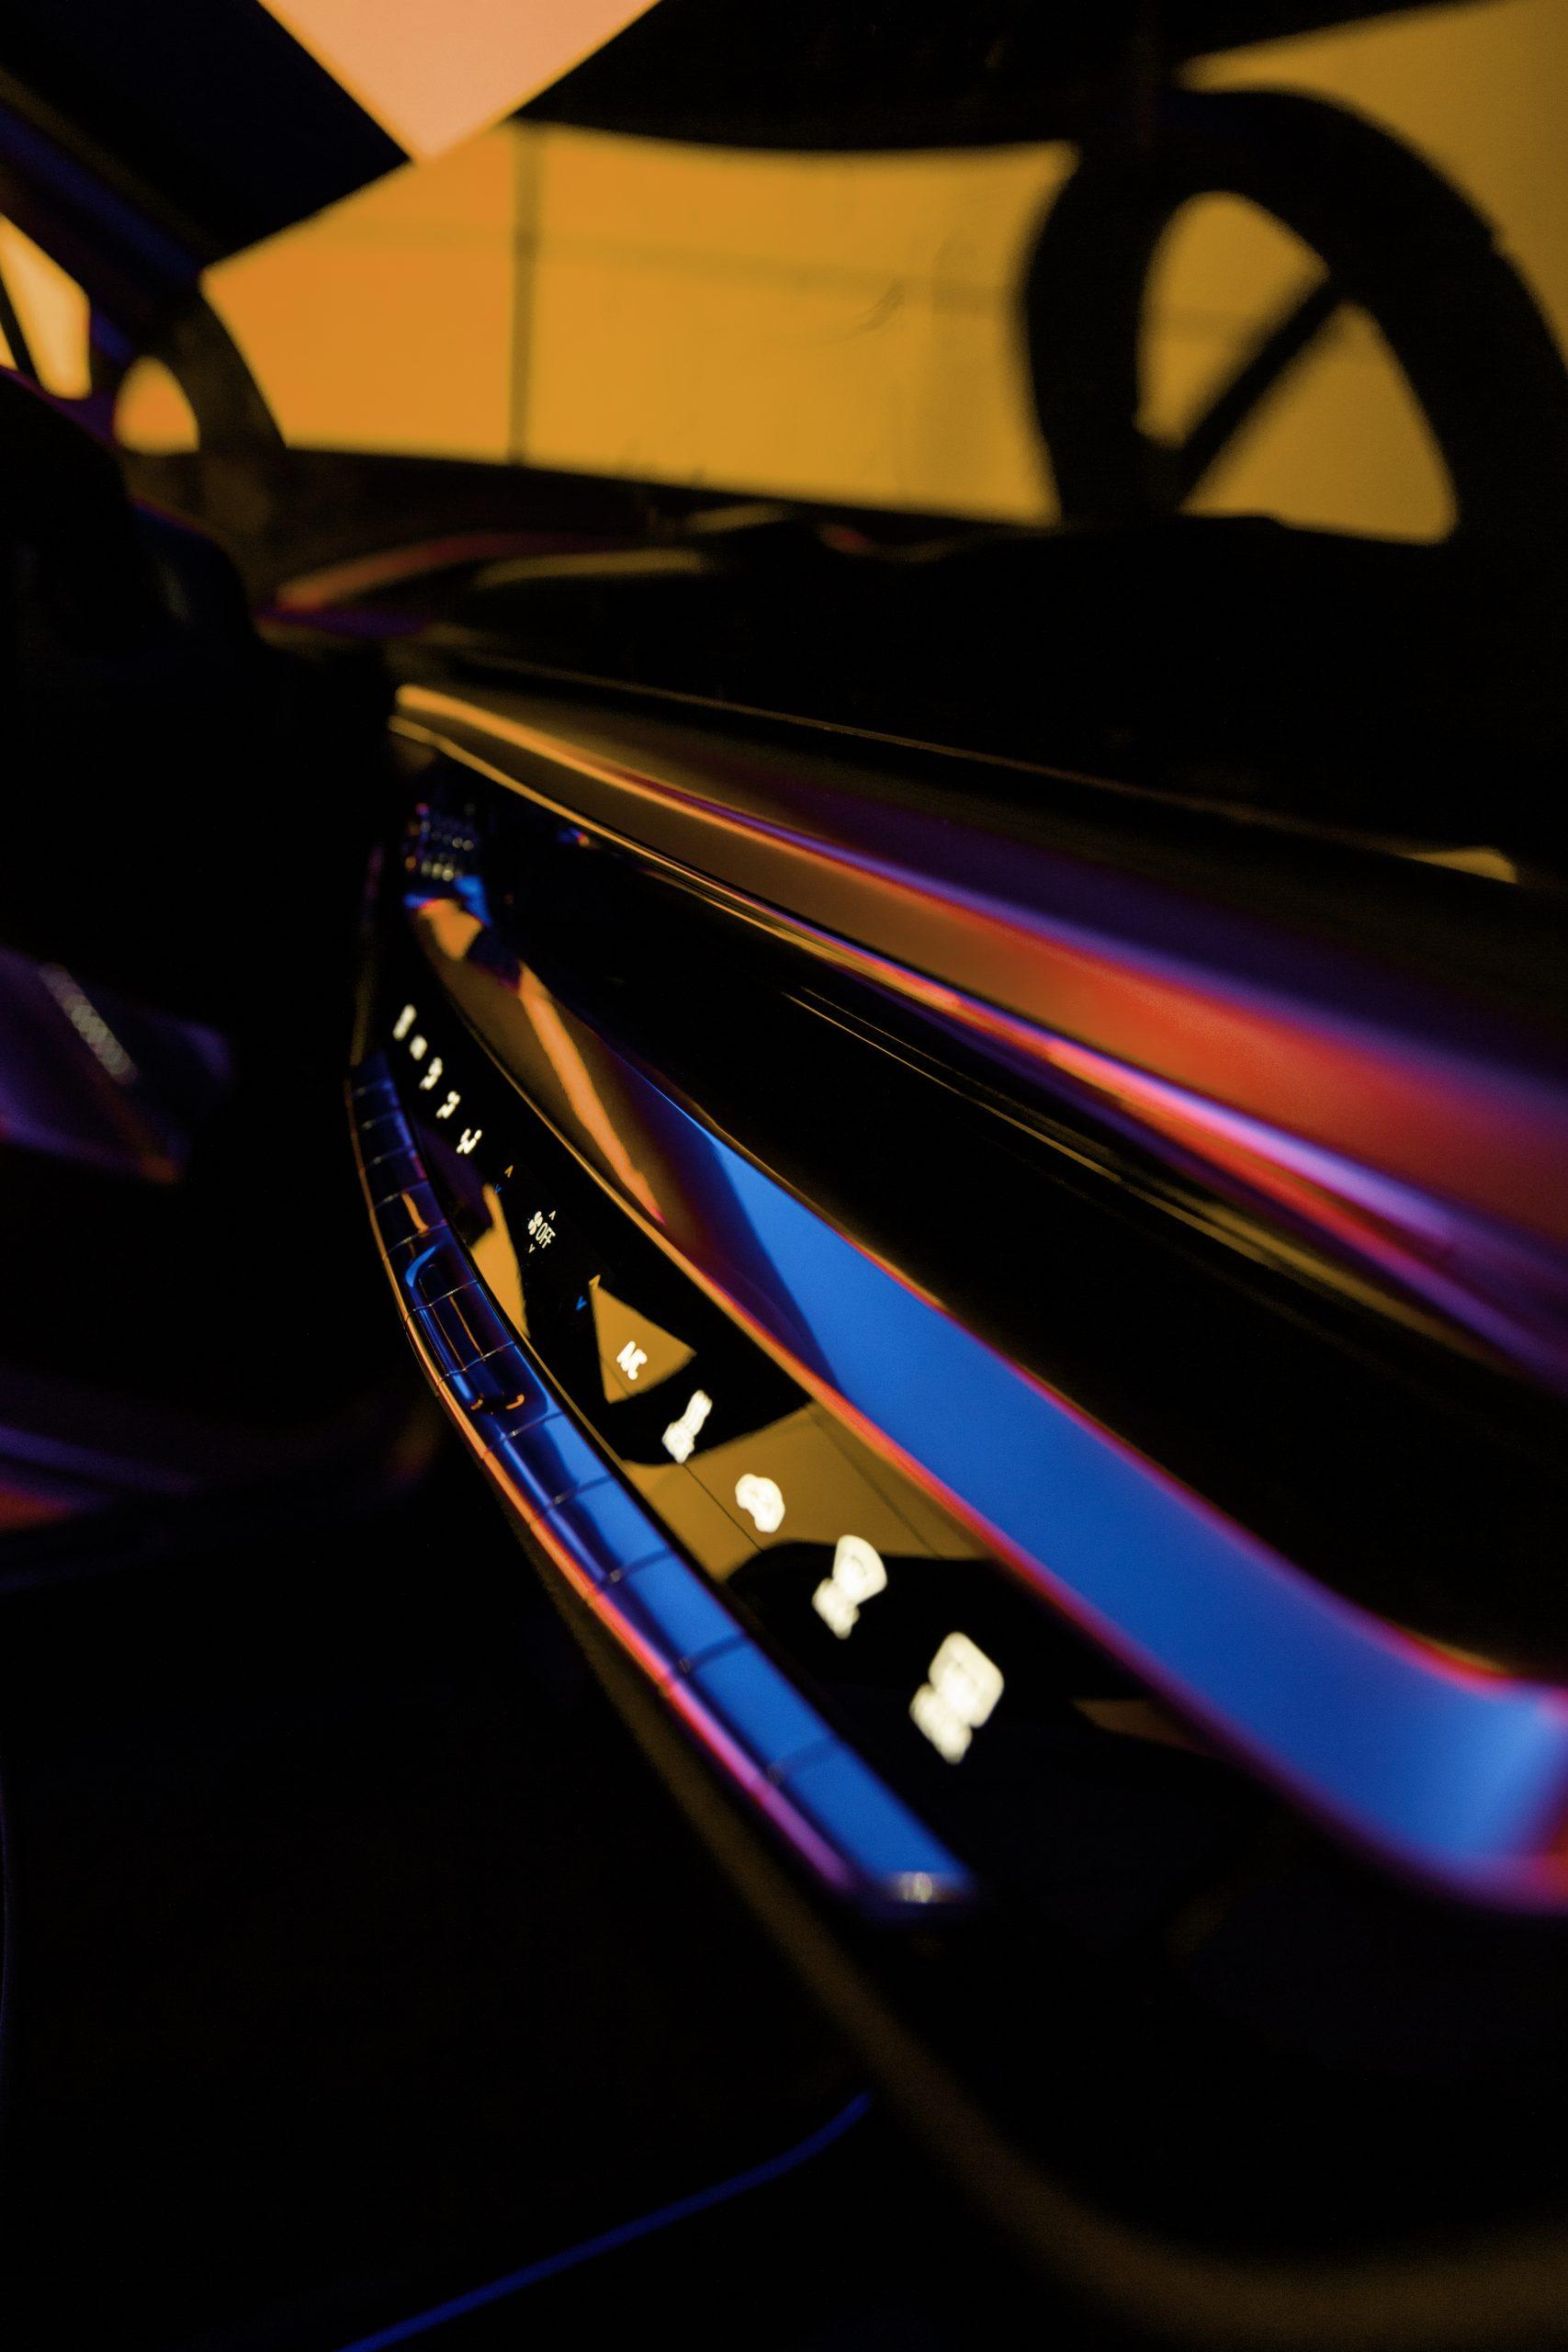 2023 Cadillac Lyriq interior dash buttons